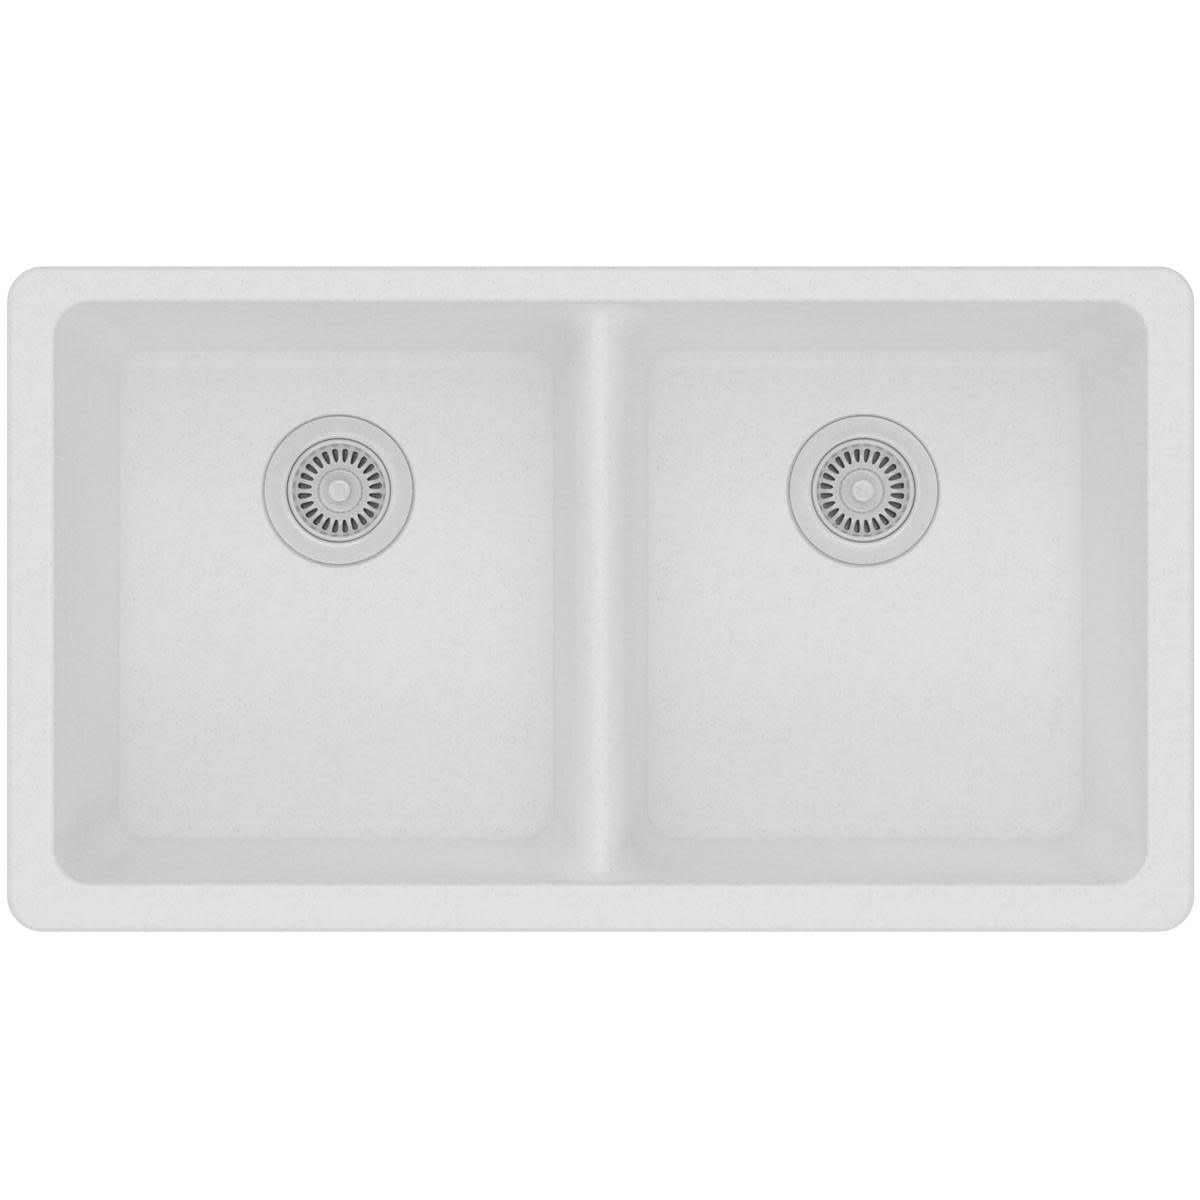 Elkay Quartz Classic ELGU3322WH0 Equal Double Bowl Undermount Sink, White by Elkay